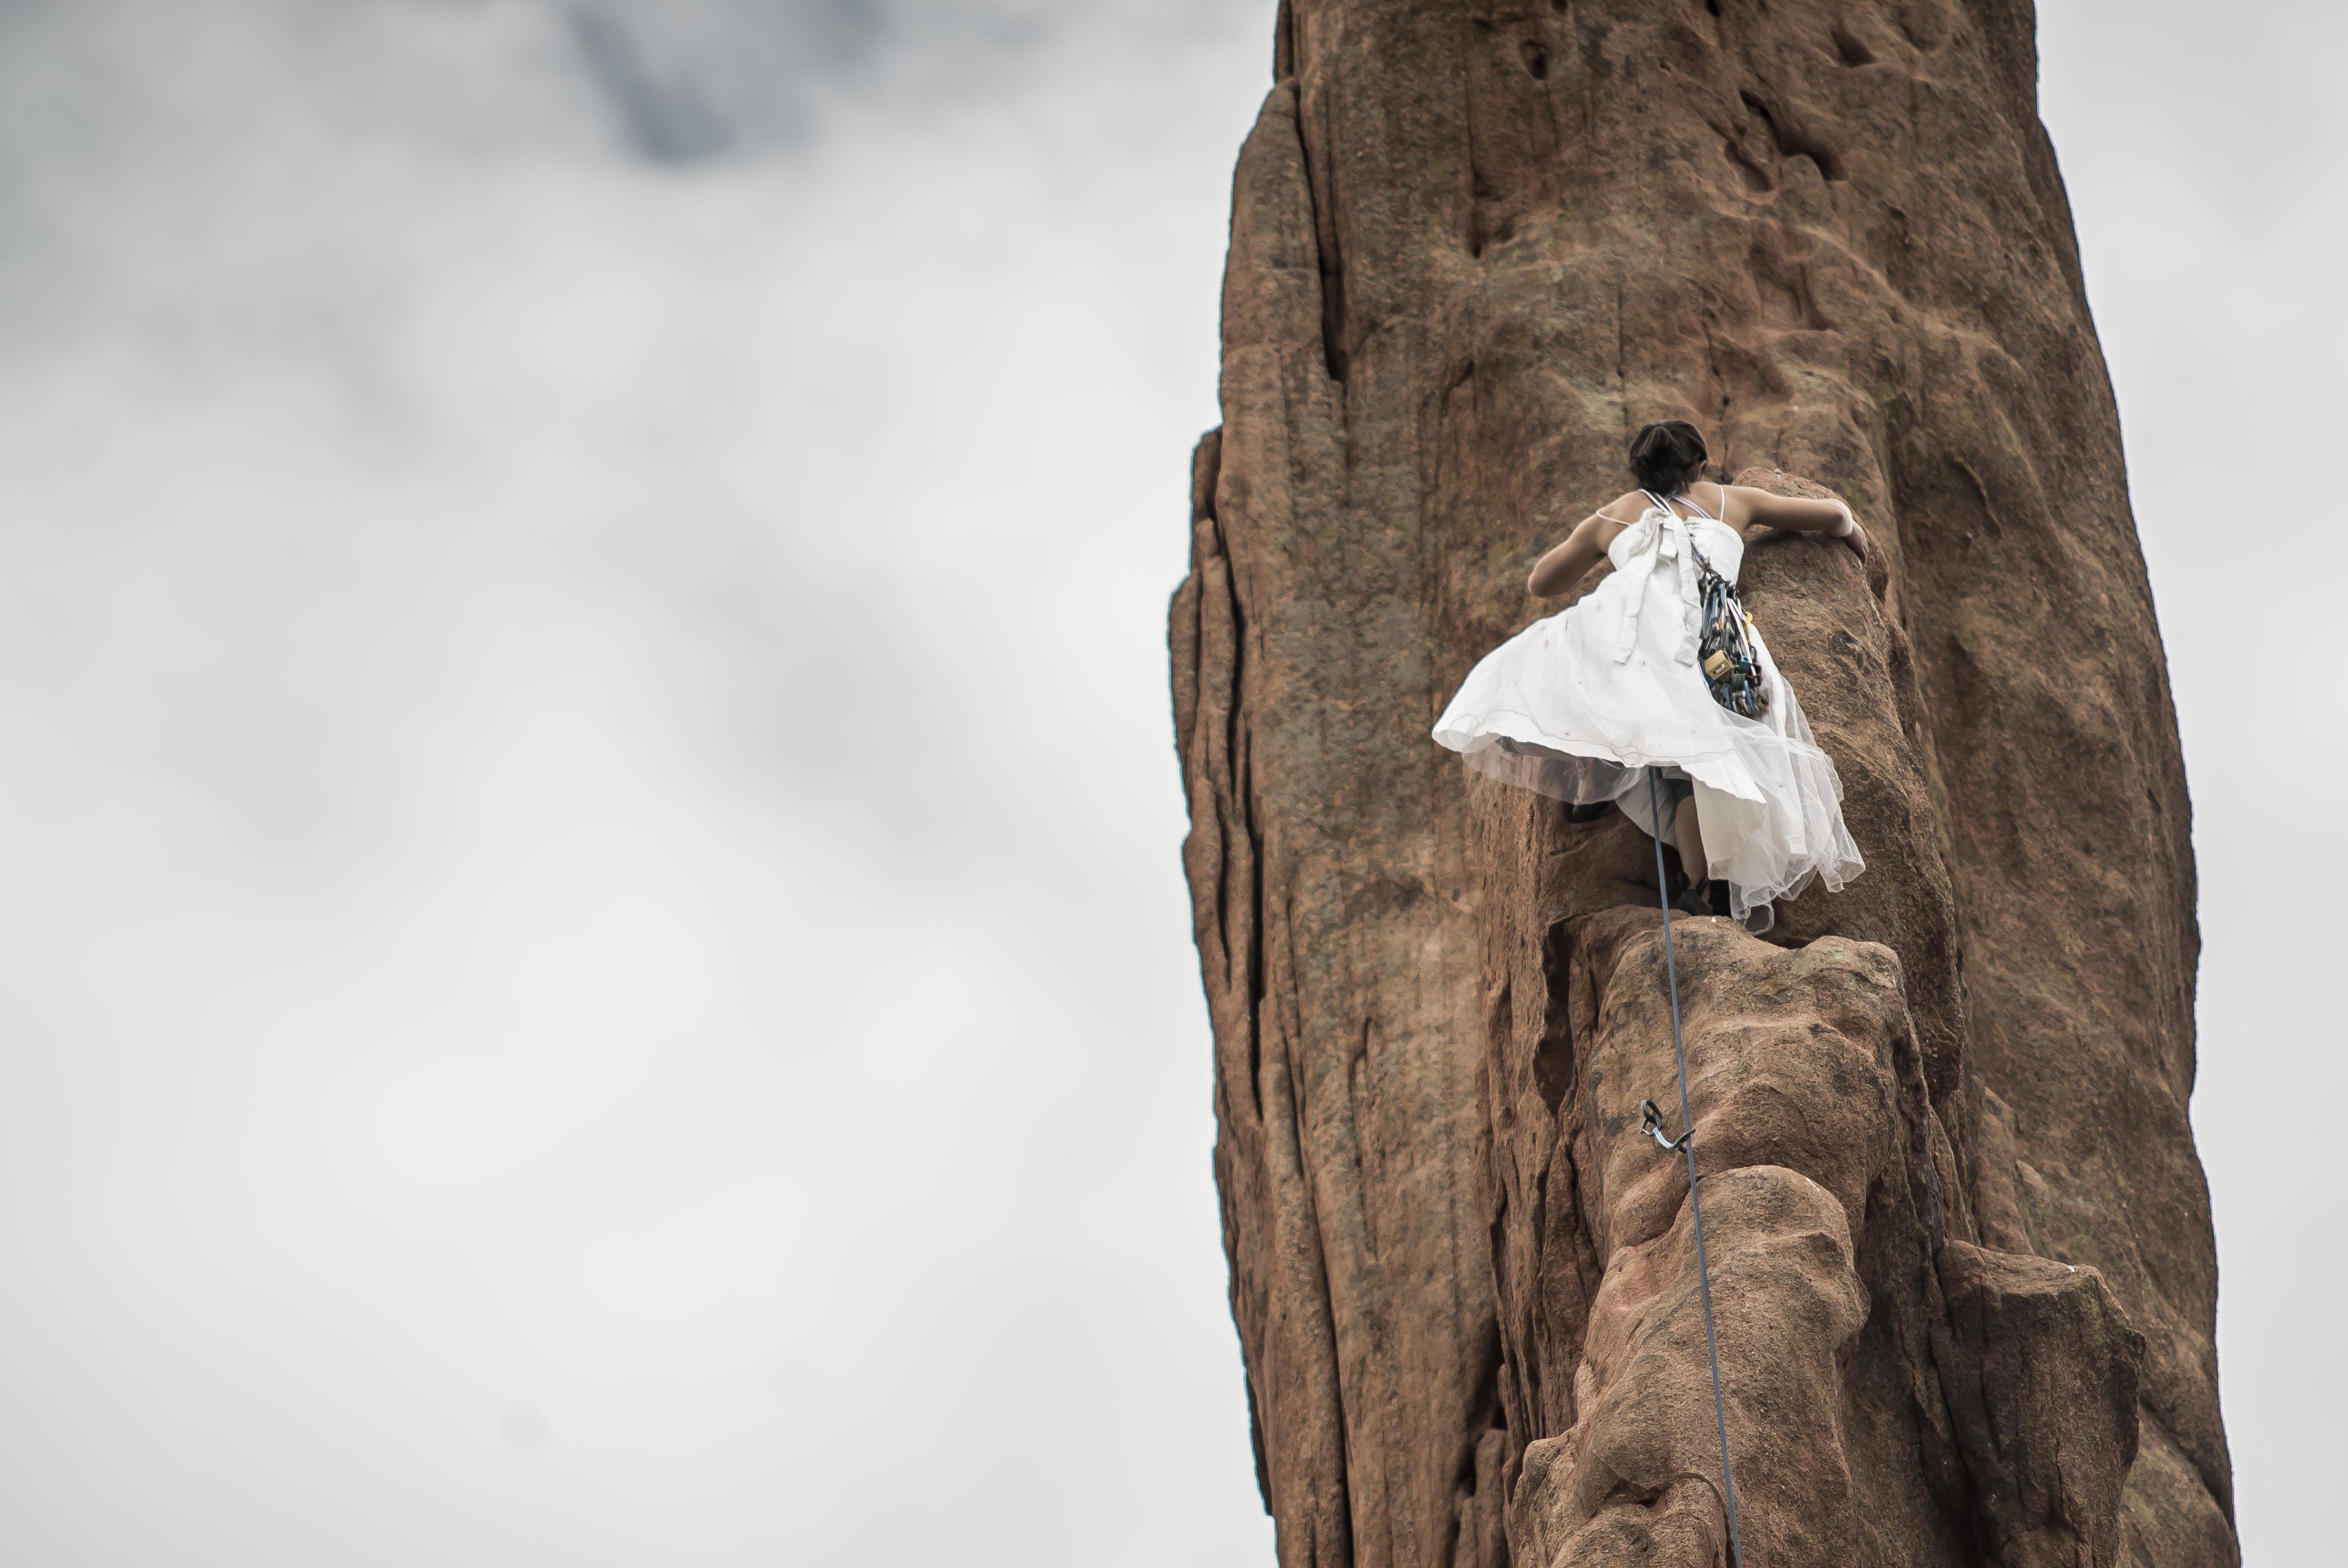 woman wearing white wedding dress climbing on brown rock under white sky